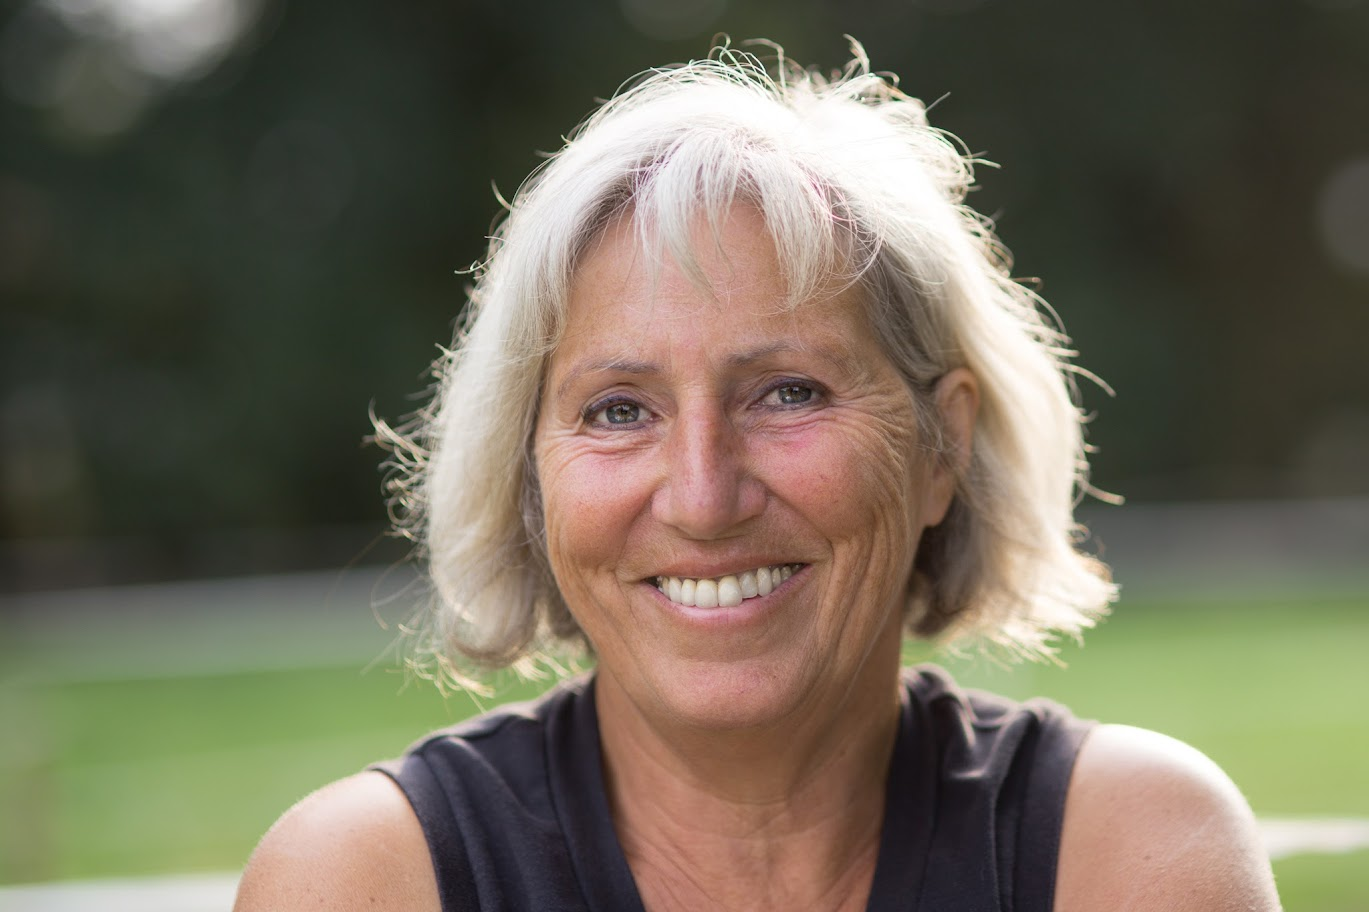 Monika Genßler